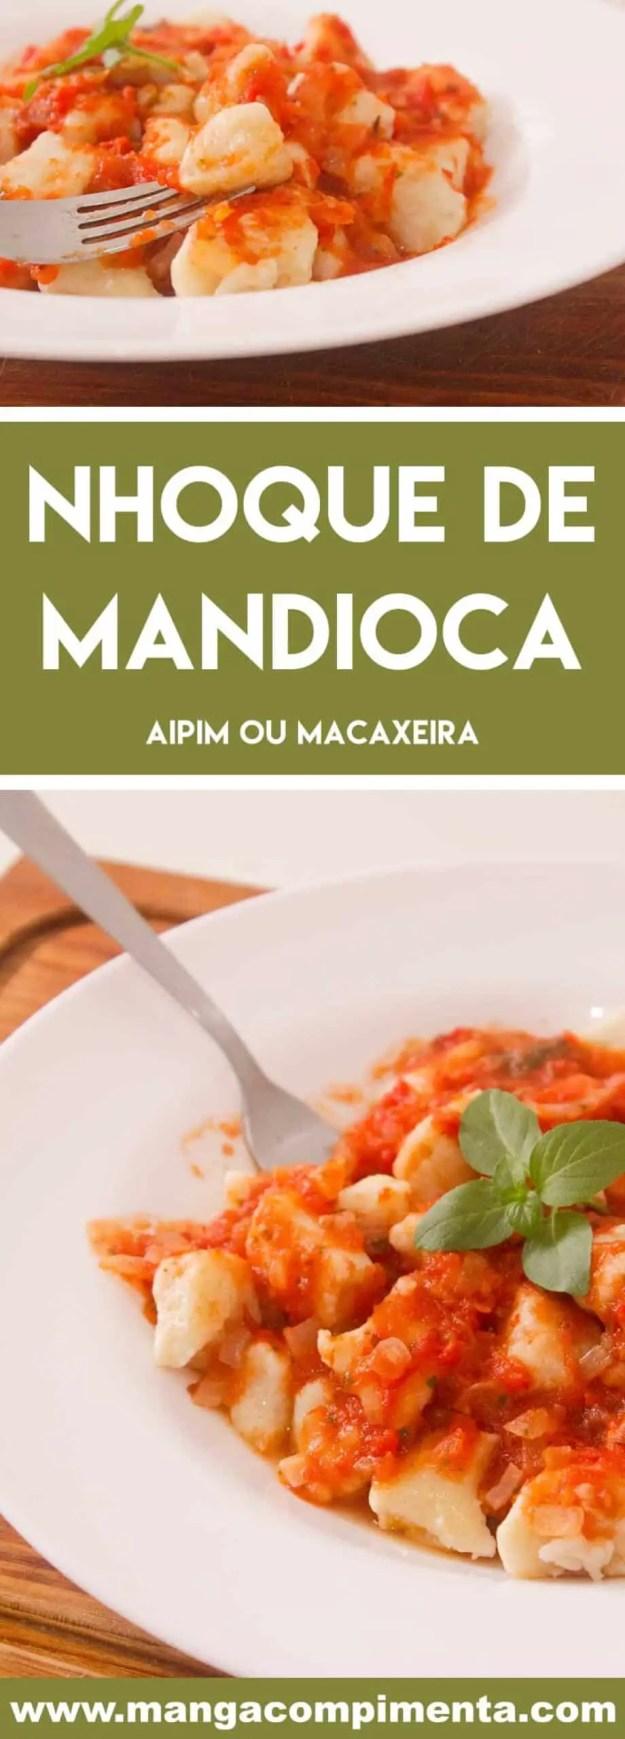 Receita de Nhoque de Mandioca ou Aipim e/ou Macaxeira - um prato delicioso para o almoço de domingo.